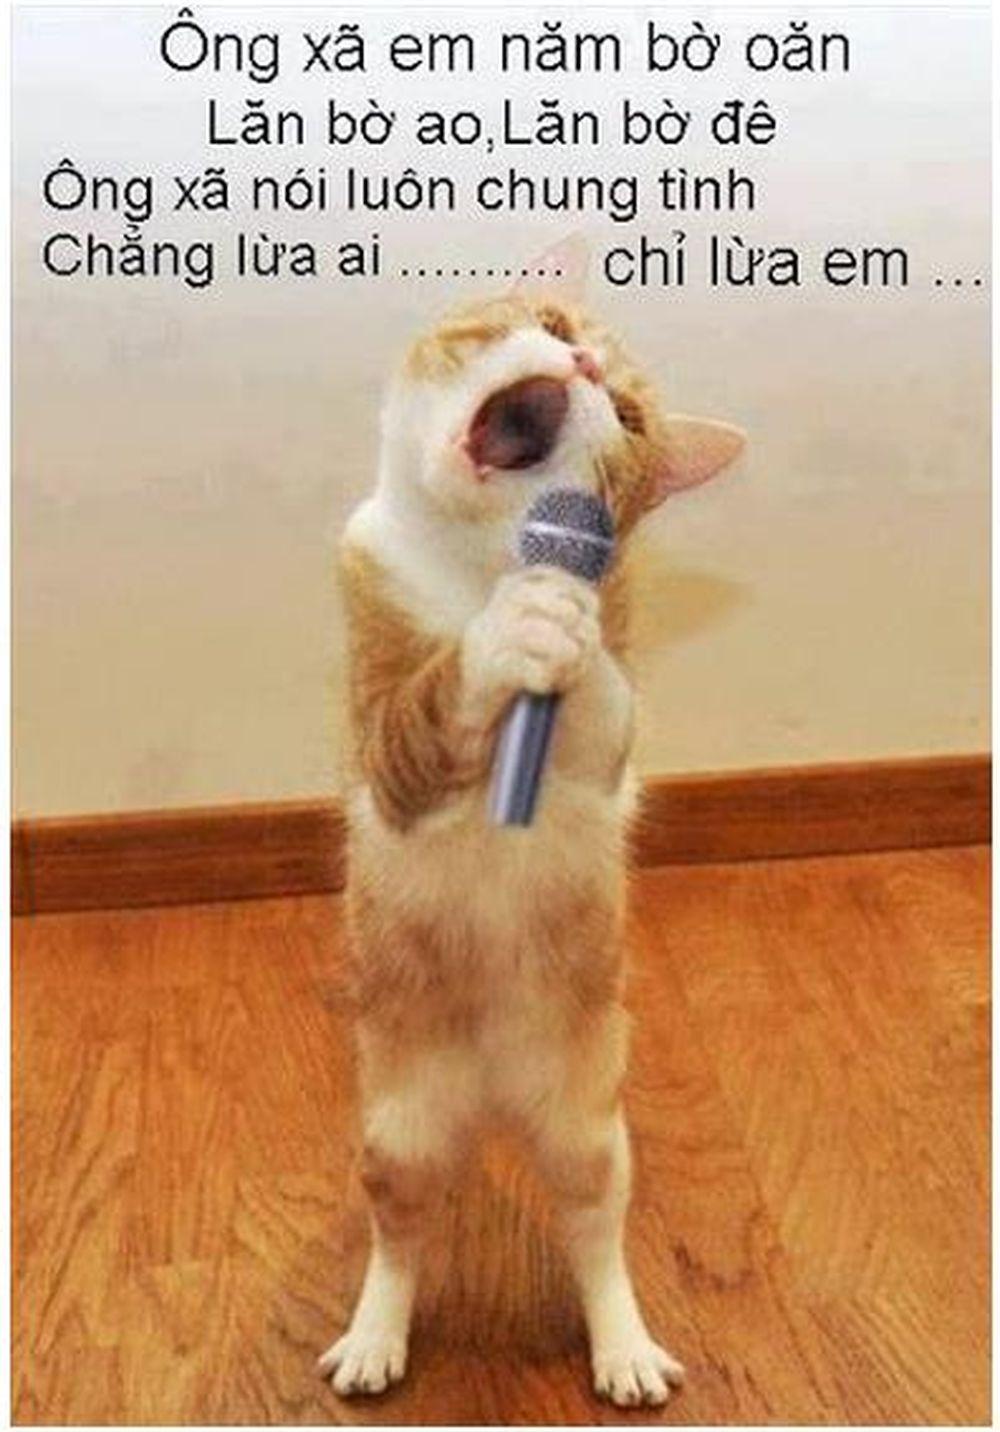 Mèo hát karaoke với bài \